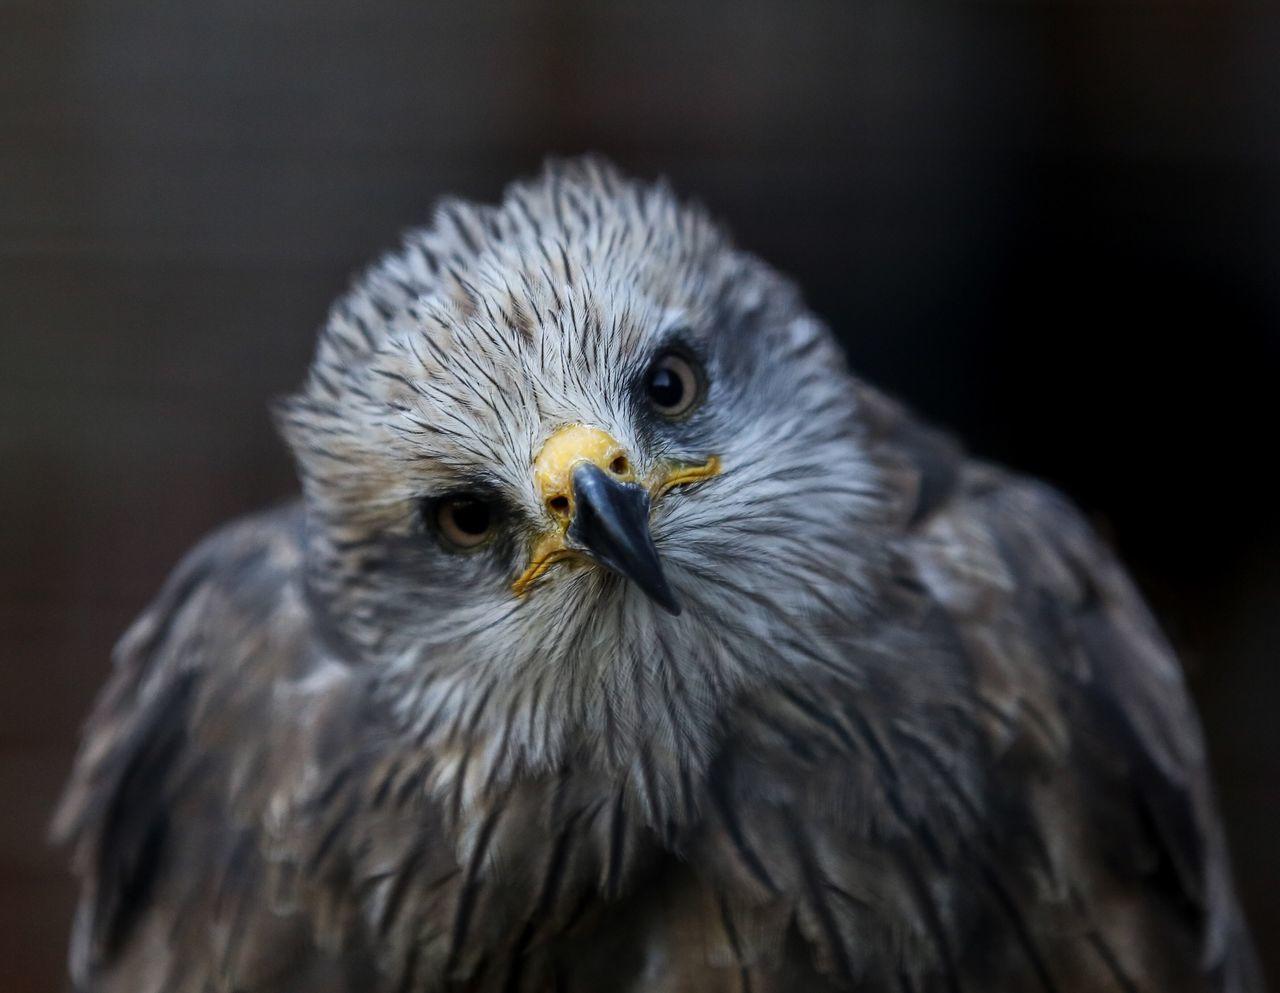 Portrait of bird